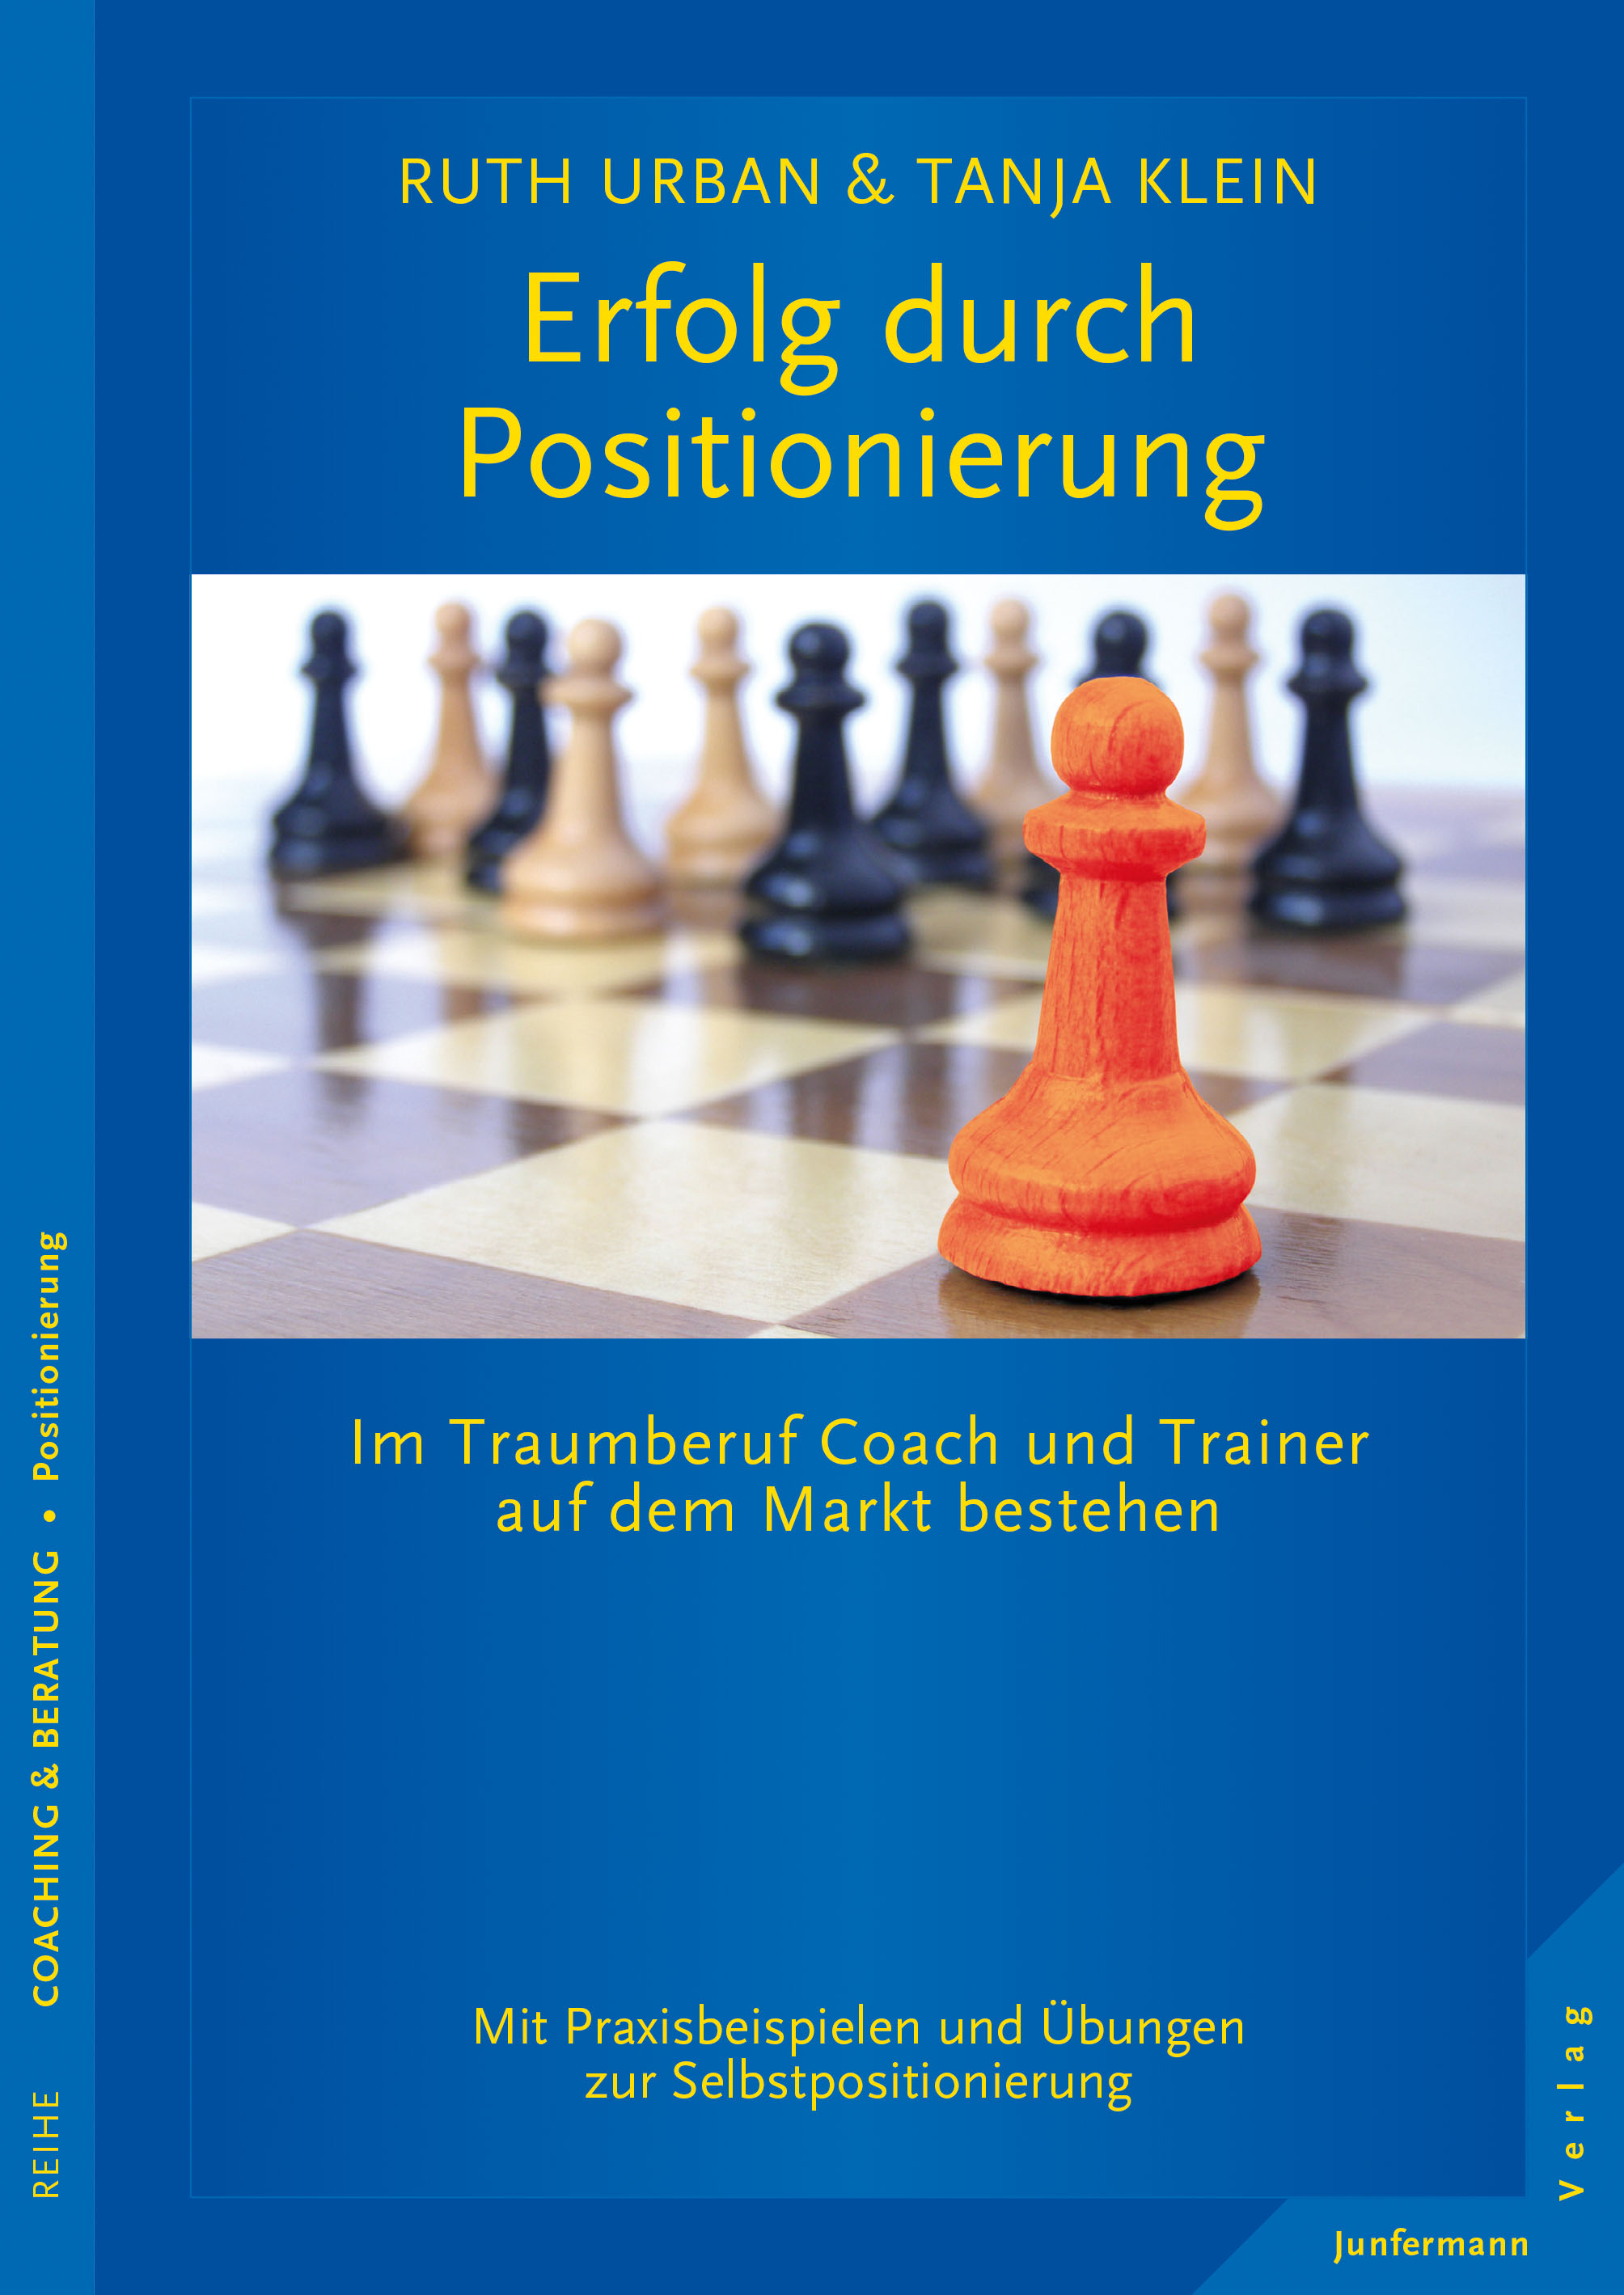 KleinUrban-Positionierung_VAR1.qxp_Cover-Vorschau